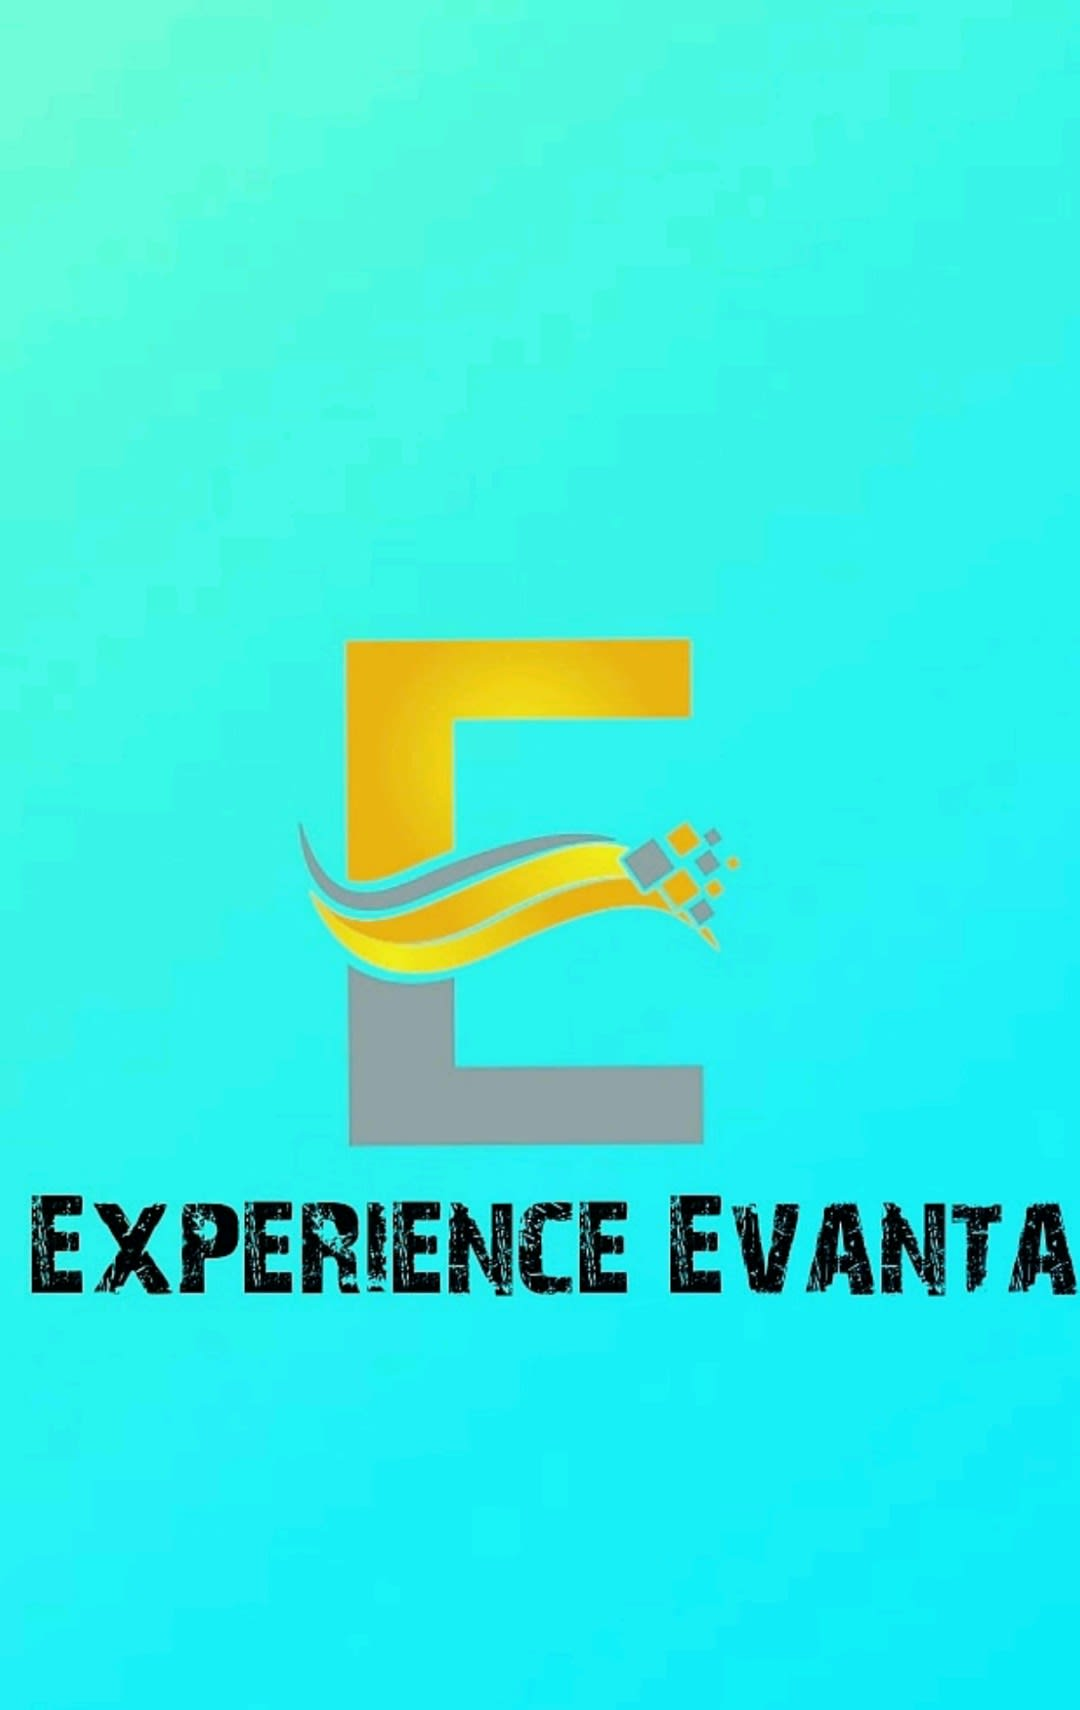 Experience Eventa